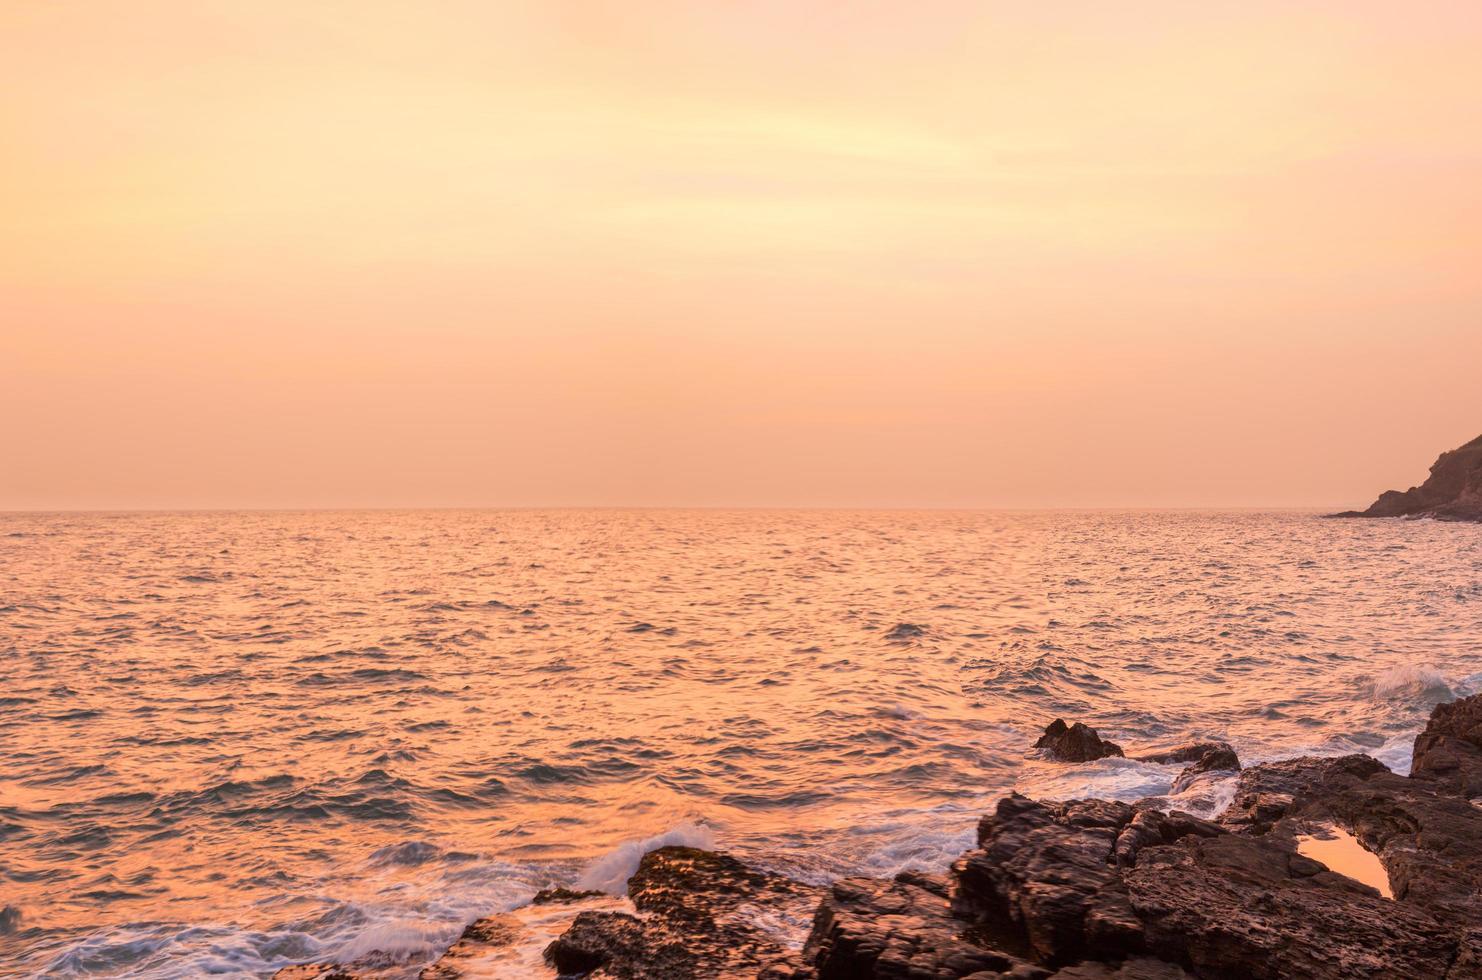 das Meer bei Sonnenuntergang foto